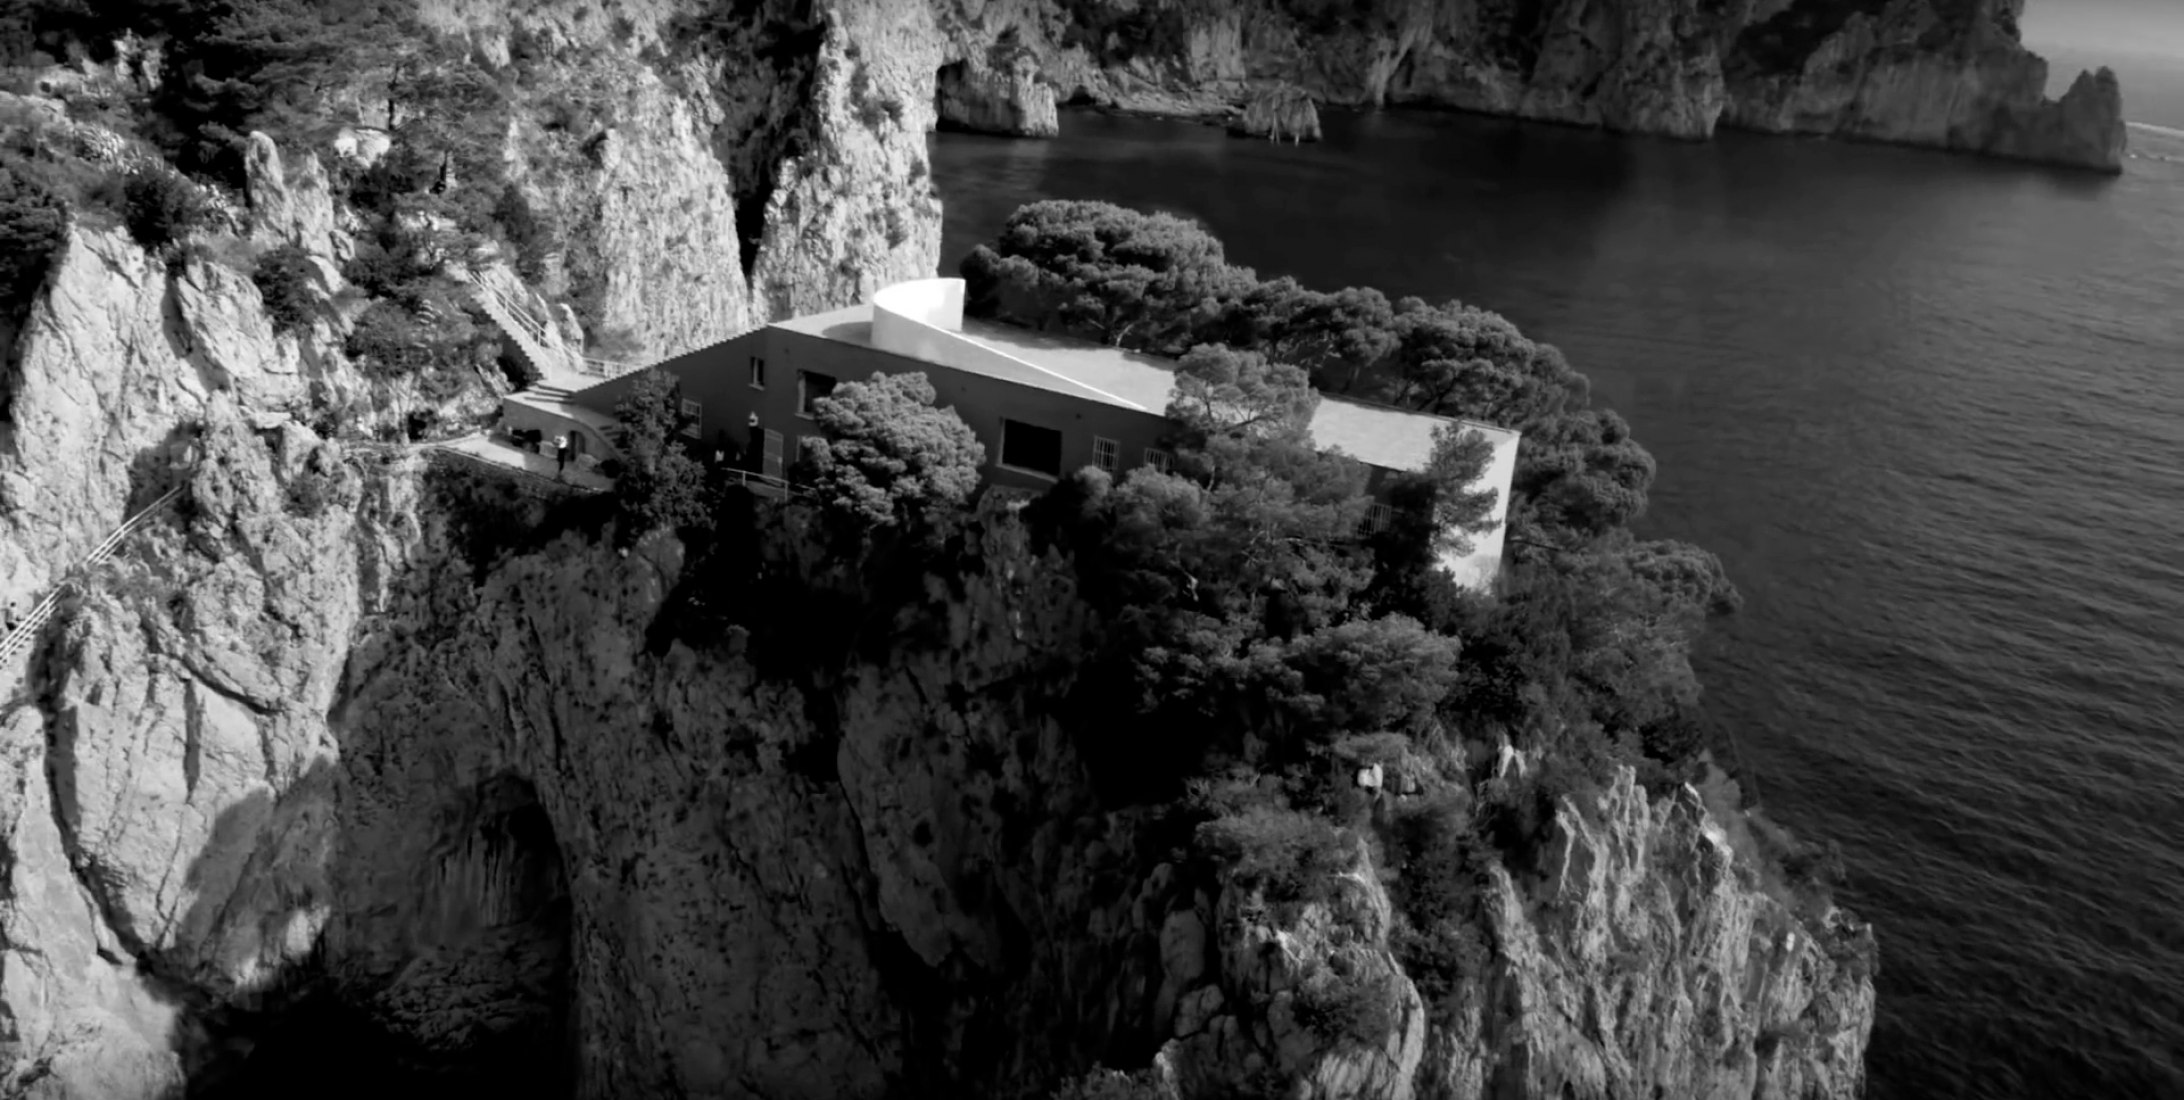 Screenshot. Casa Malaparte. KATE MOSS & JAMIE BOCHERT